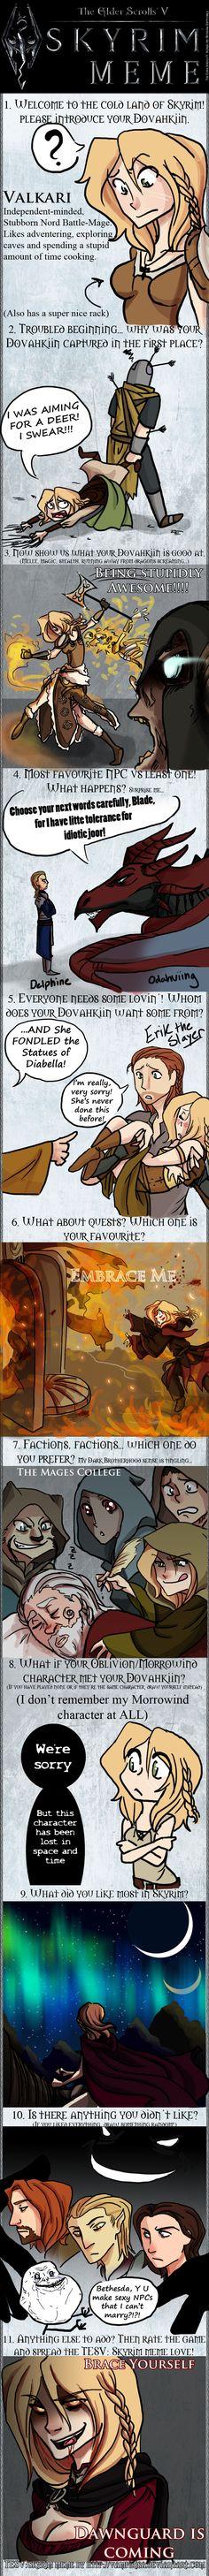 Skyrim Meme with Valkari by the-Orator on DeviantArt - Hilarious. Skyrim Comic, Skyrim Game, Skyrim Funny, Elder Scrolls Memes, Elder Scrolls V Skyrim, Elder Scrolls Online, Humour Geek, Gamer Humor, Gaming Memes